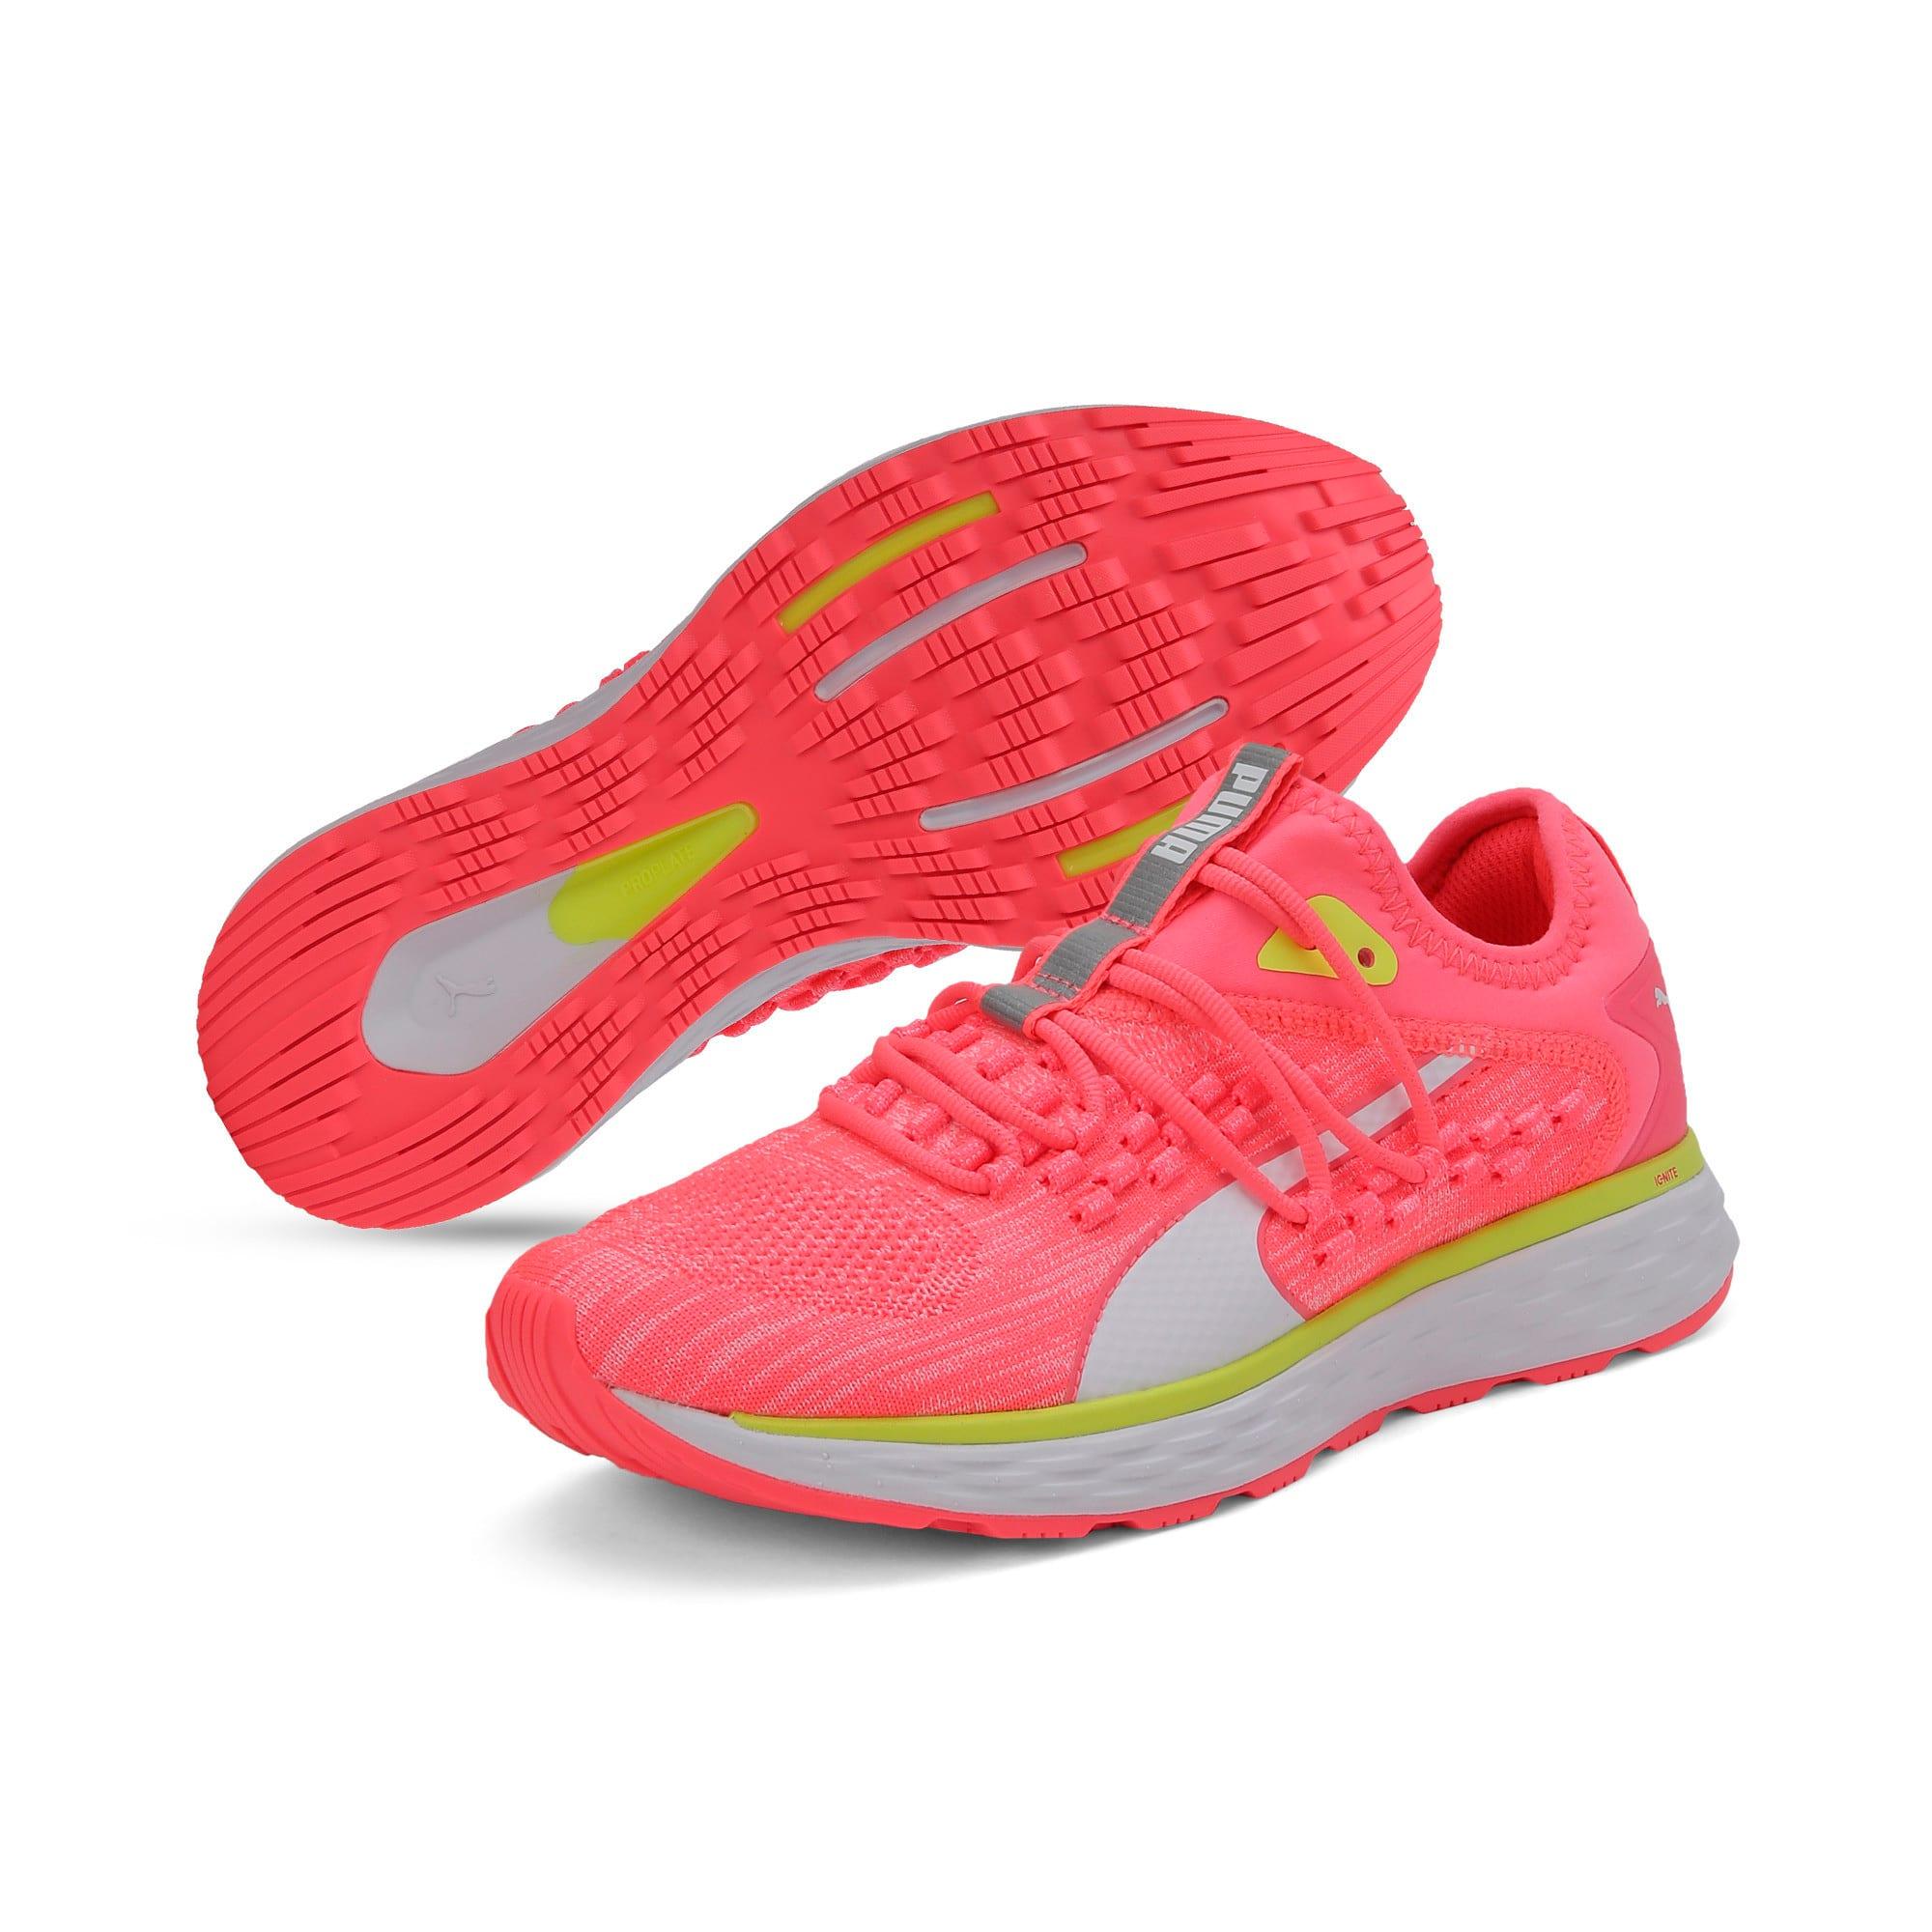 Thumbnail 4 of SPEED FUSEFIT Women's Running Shoes, Pink Alert-Puma White, medium-IND